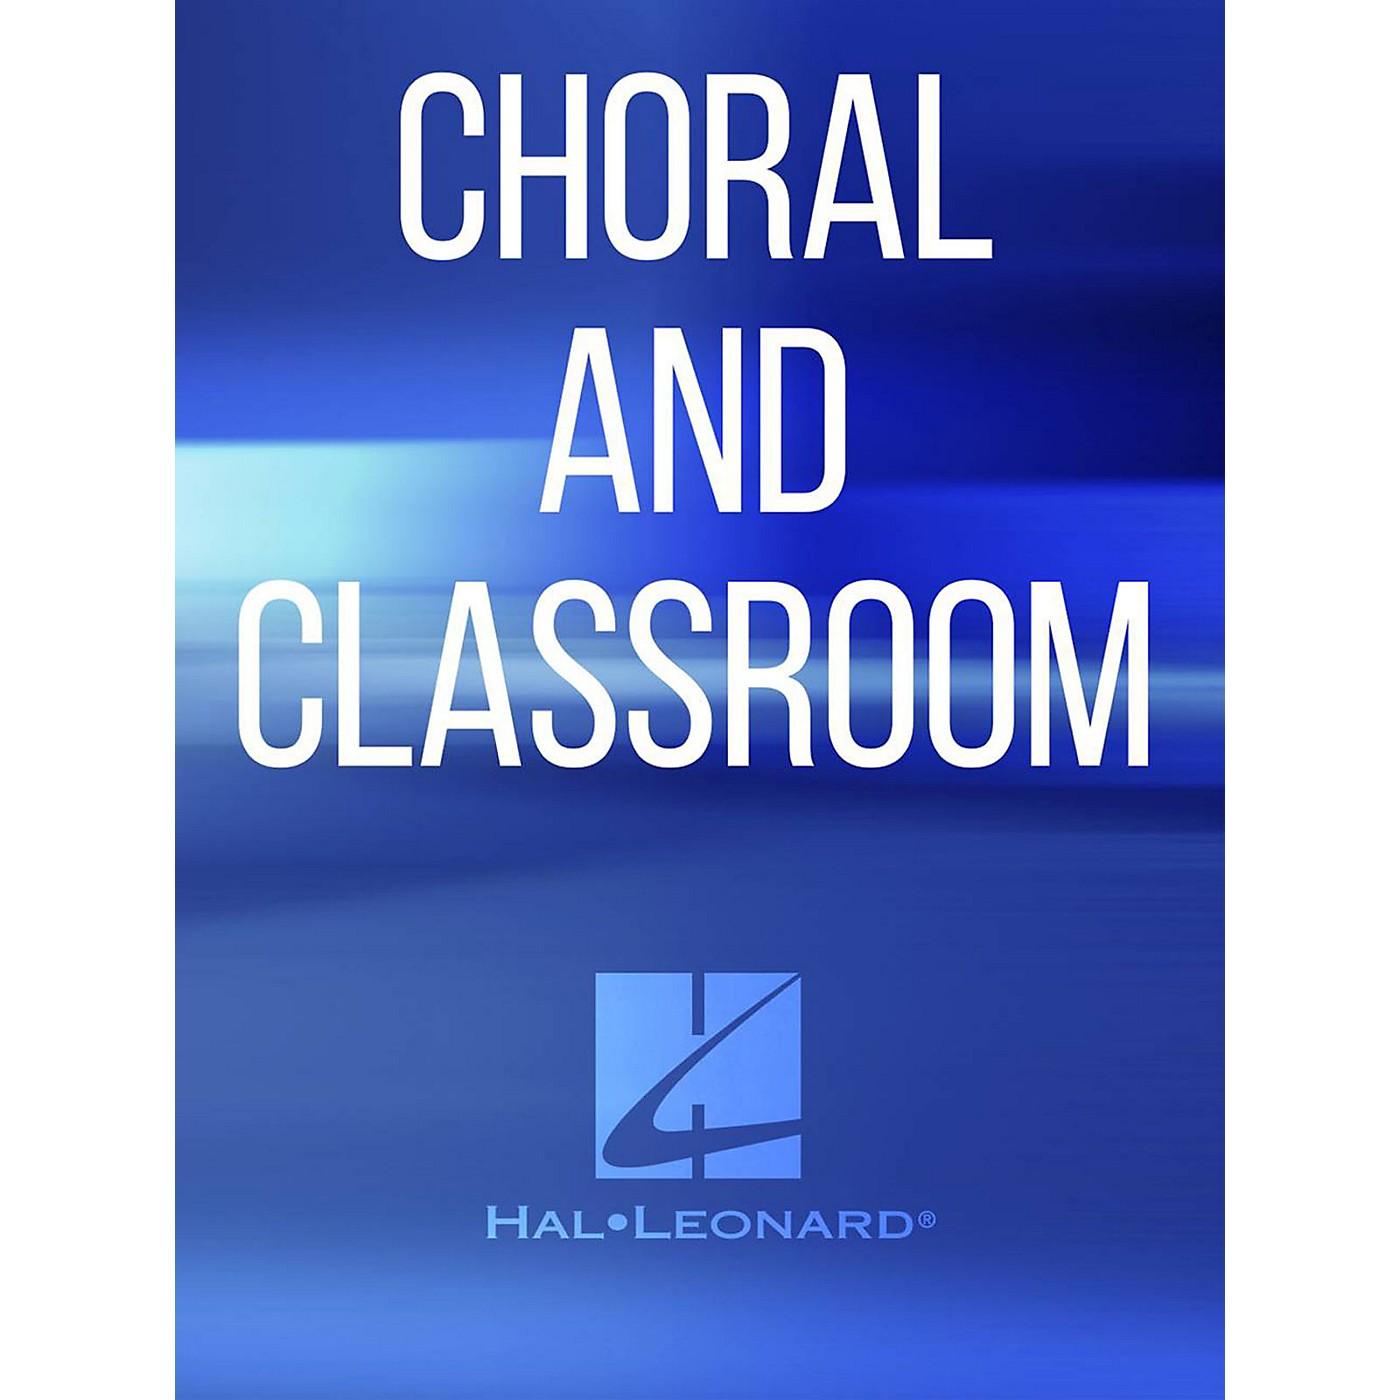 Hal Leonard Twistin' at the Hop (Medley) Studiotrax CD Arranged by Jill Gallina thumbnail